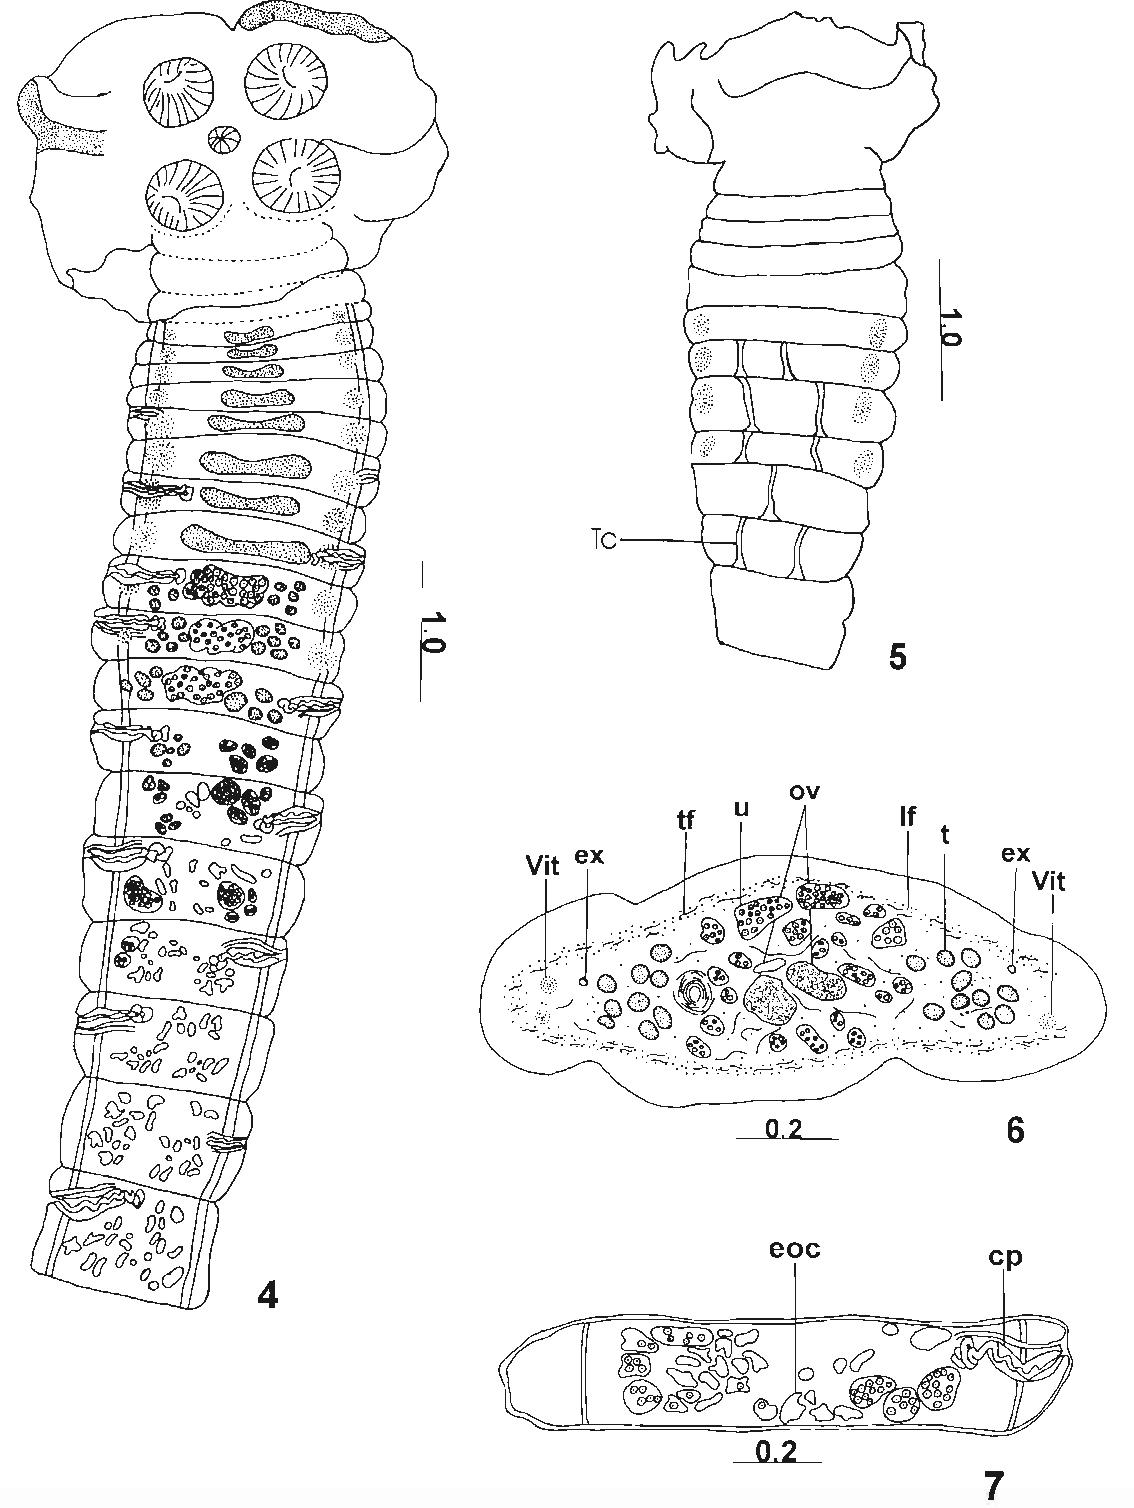 figure 4—7